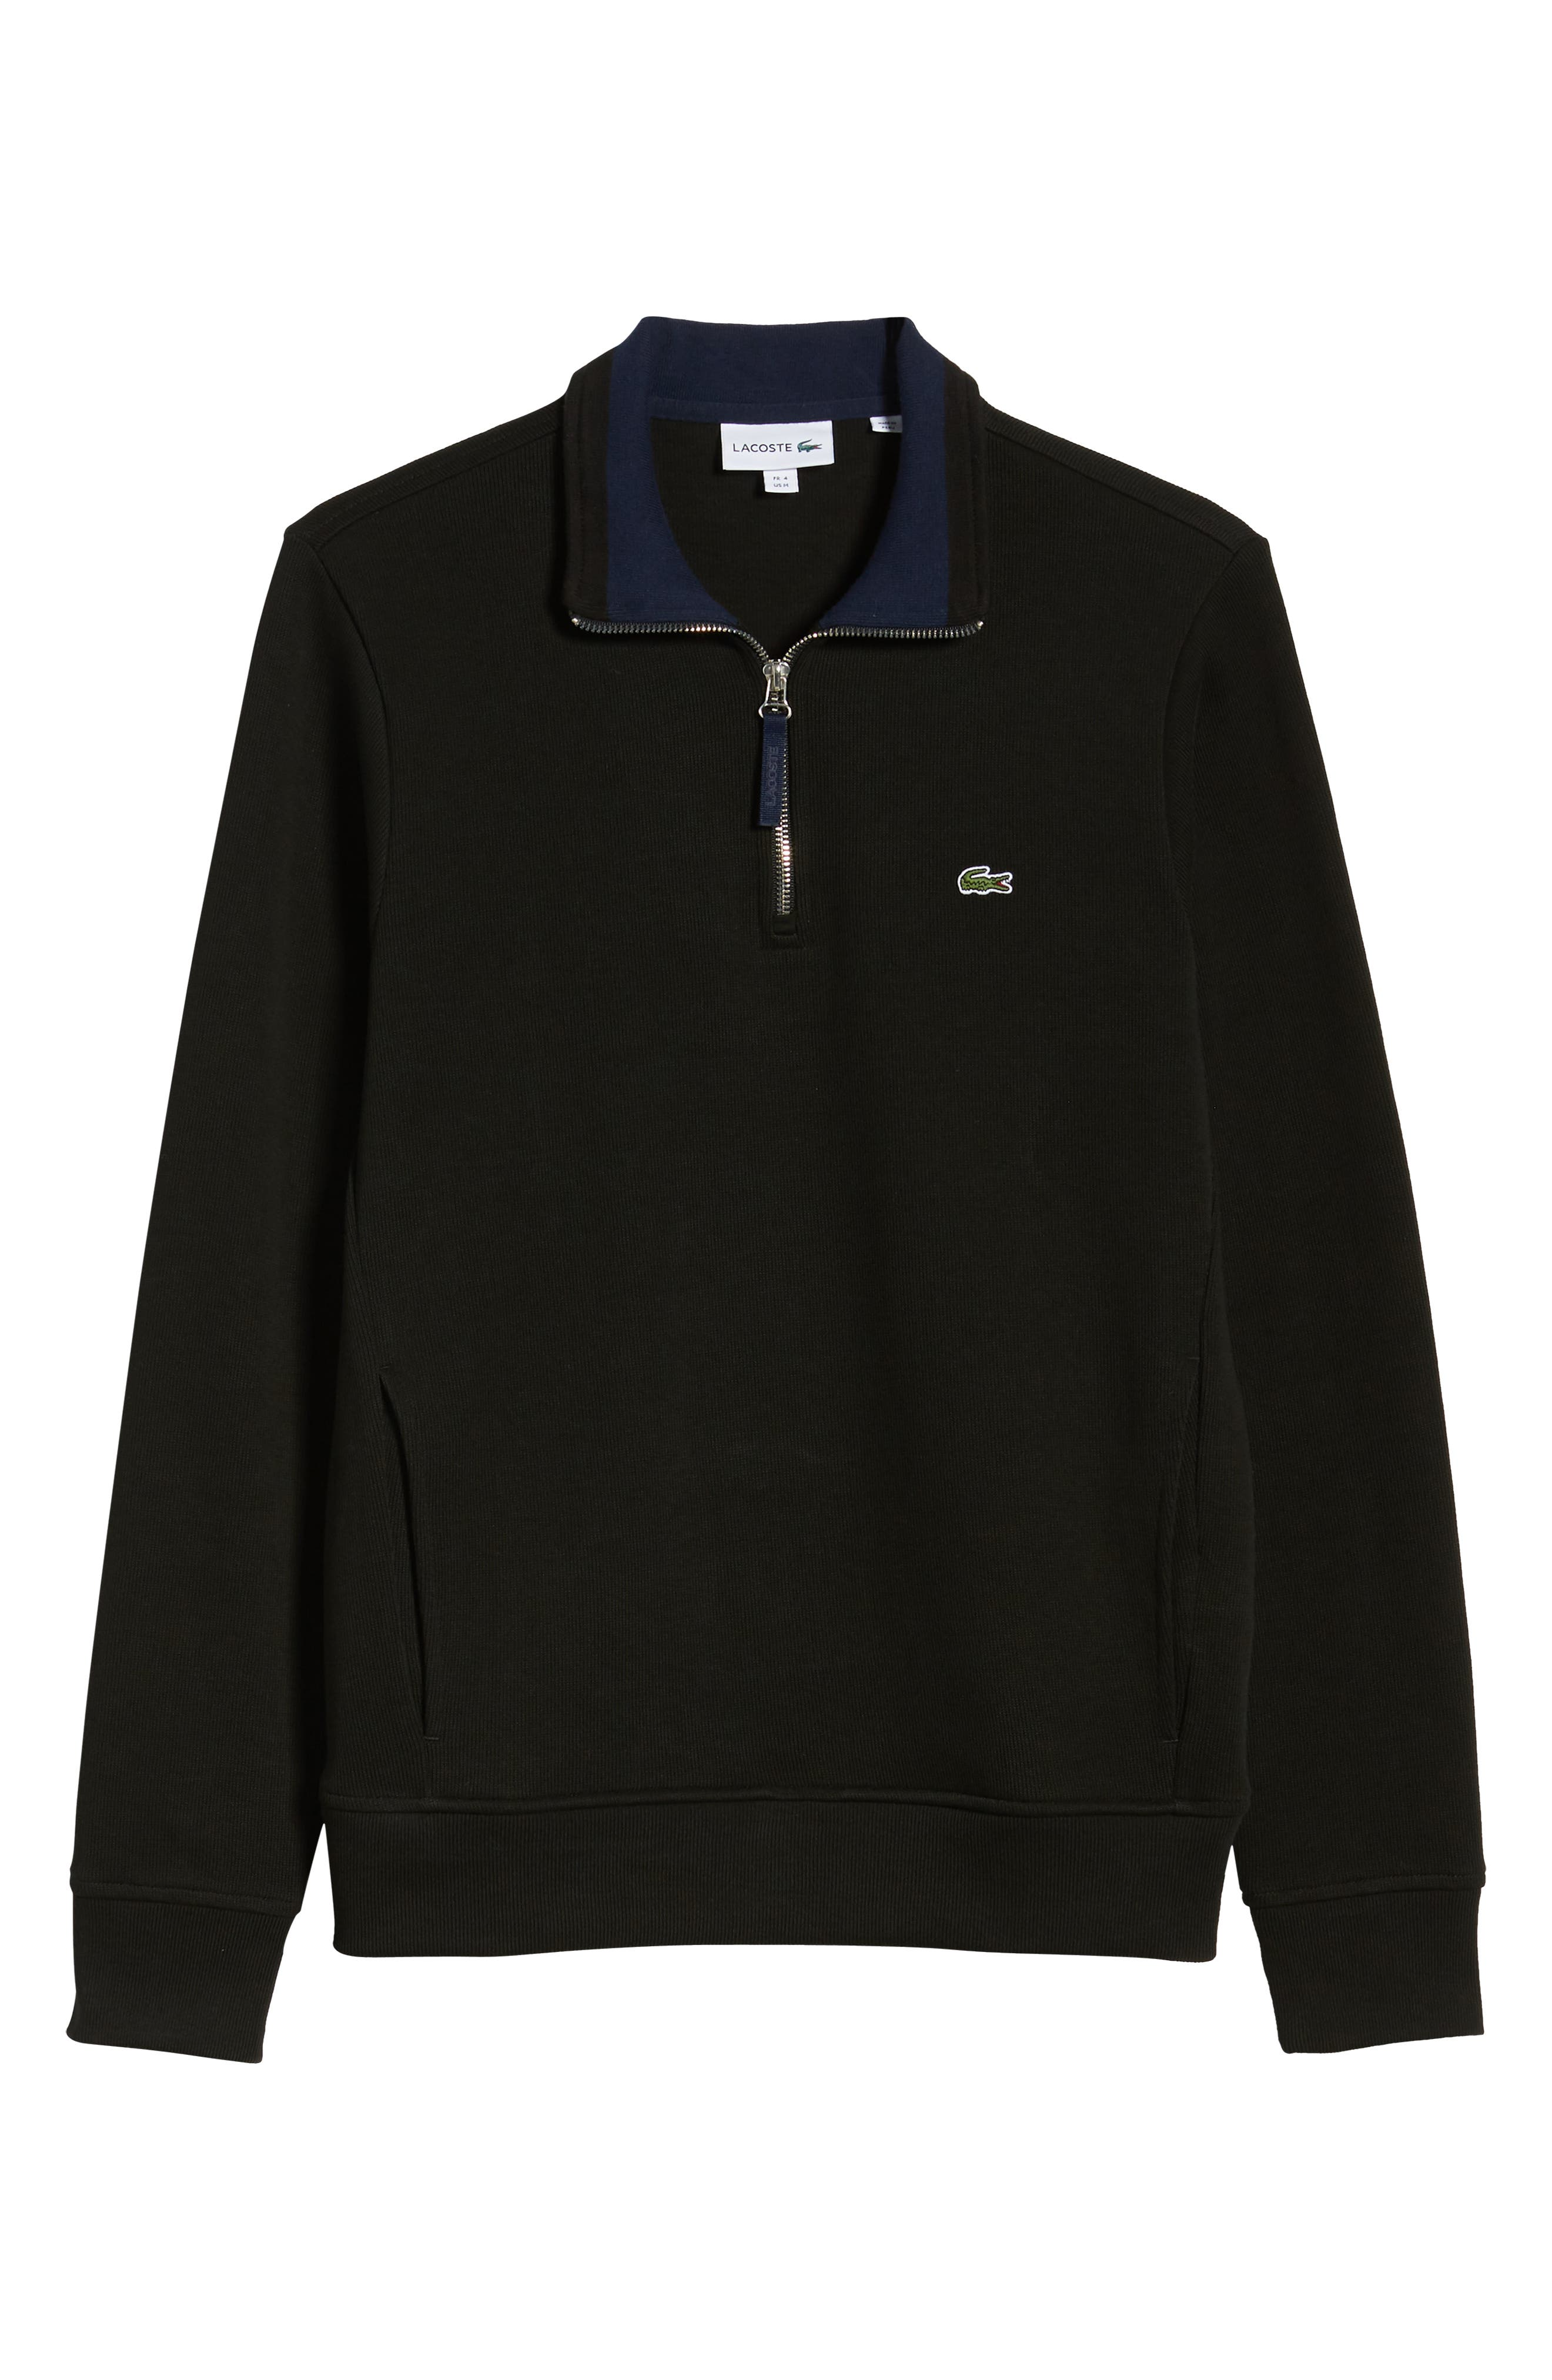 LACOSTE,                             Quarter Zip Pullover,                             Alternate thumbnail 6, color,                             BLACK/ NAVY BLUE